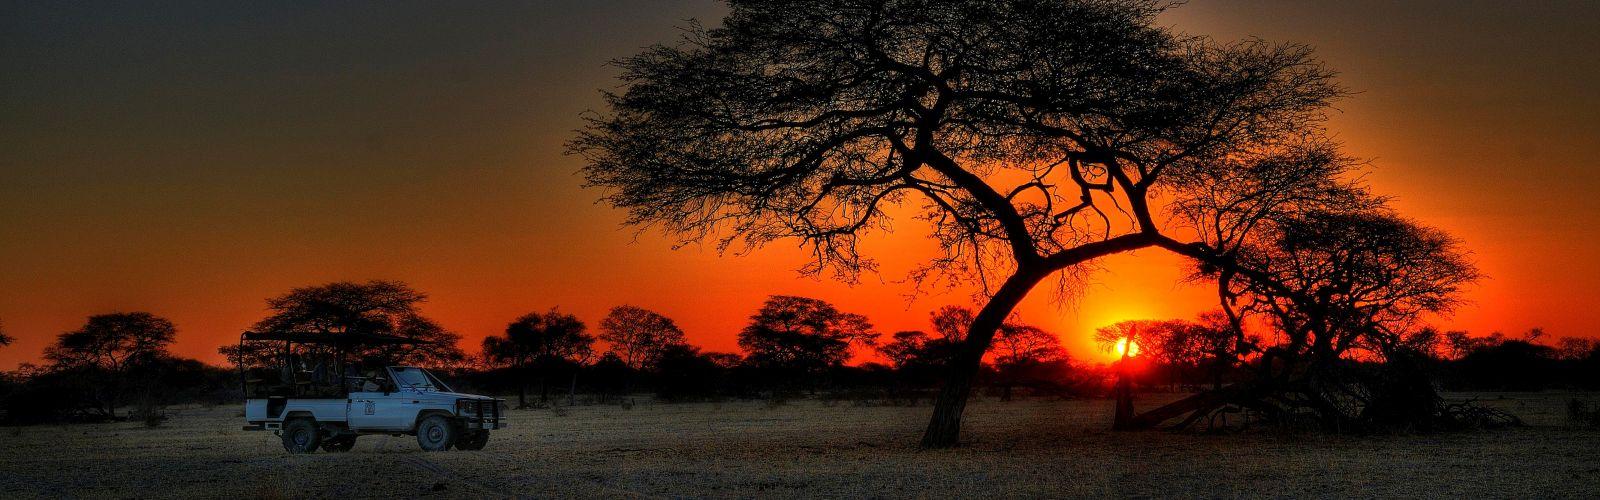 Safari en Afrika